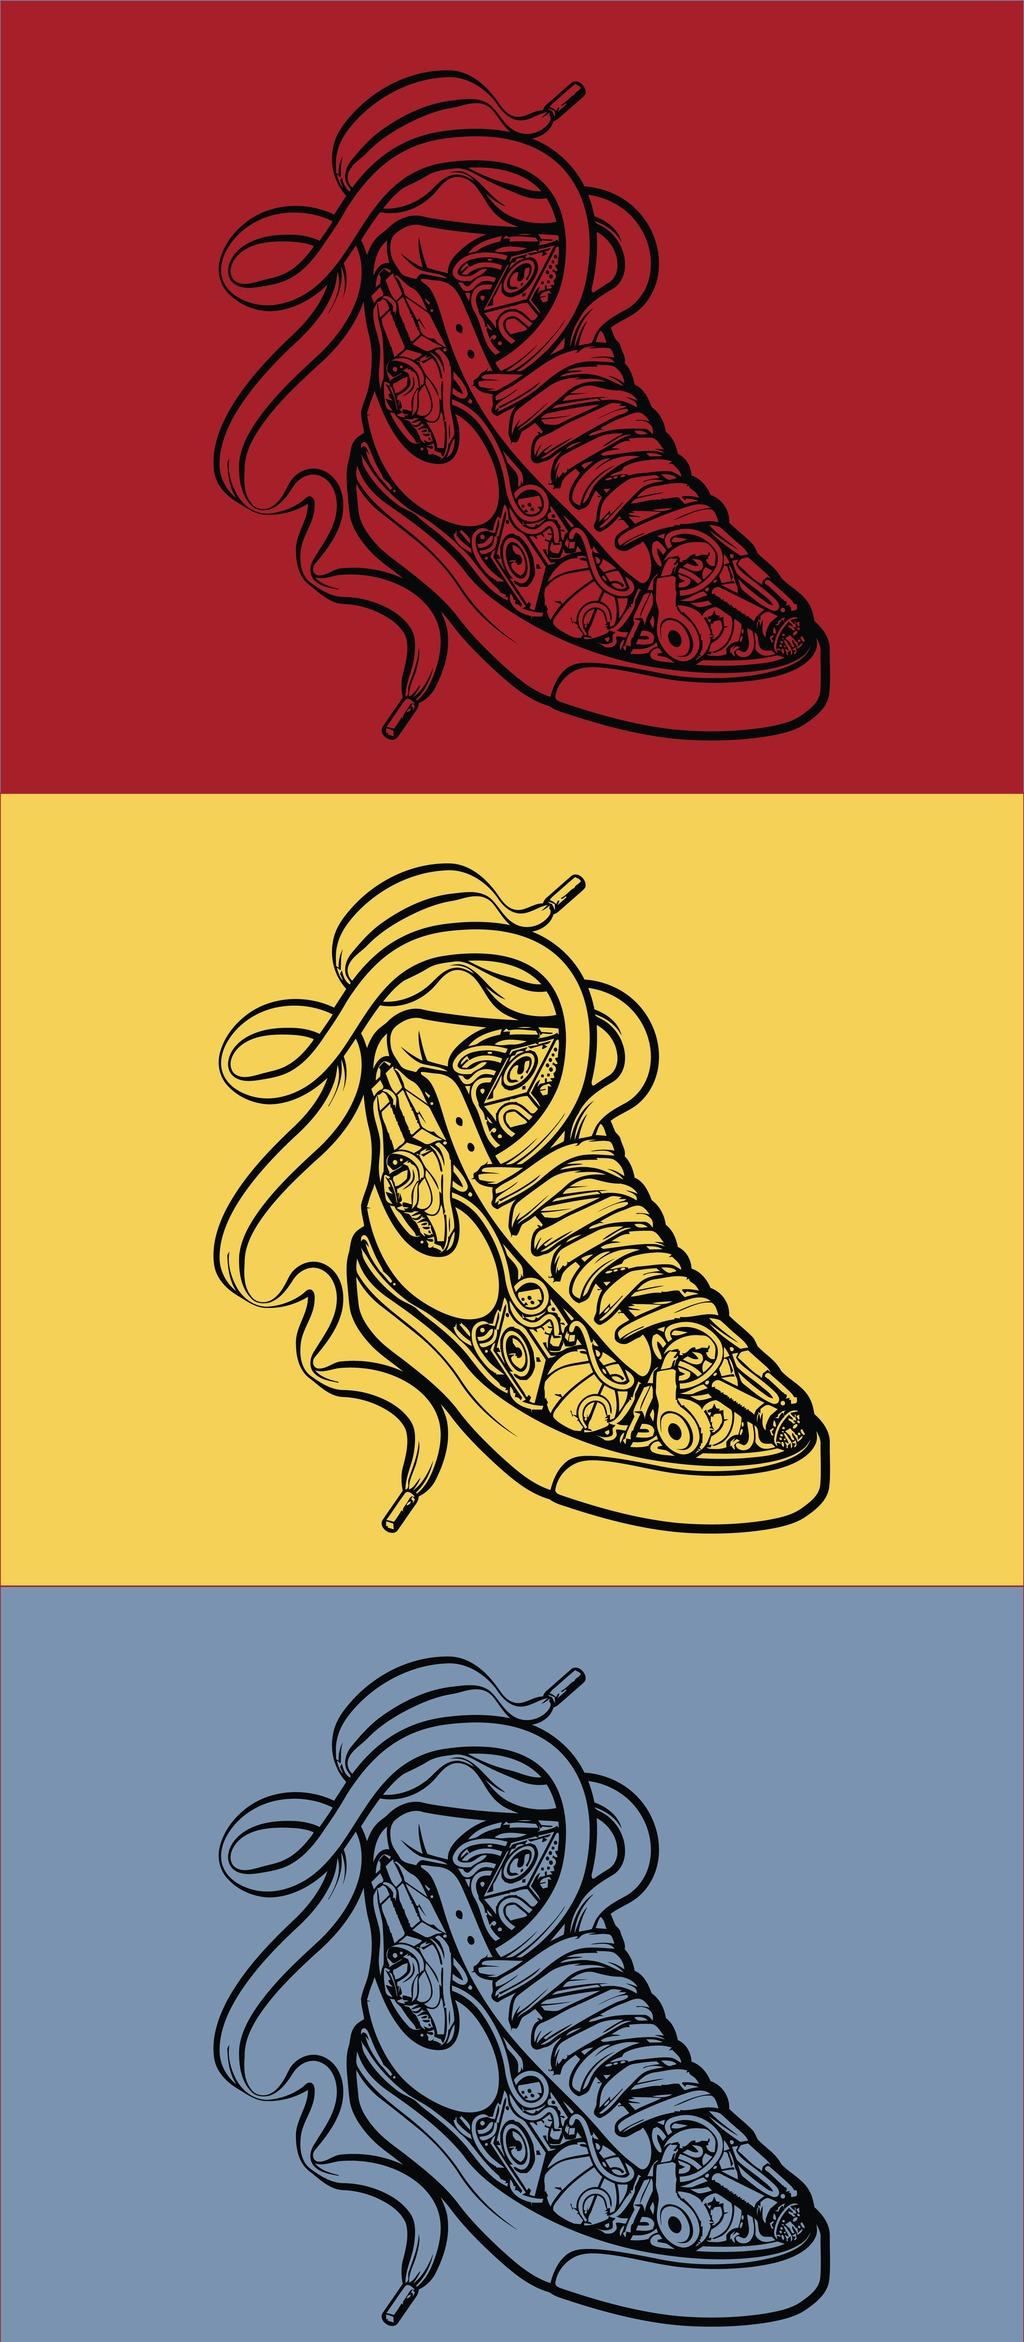 nike运动鞋卡通矢量插画